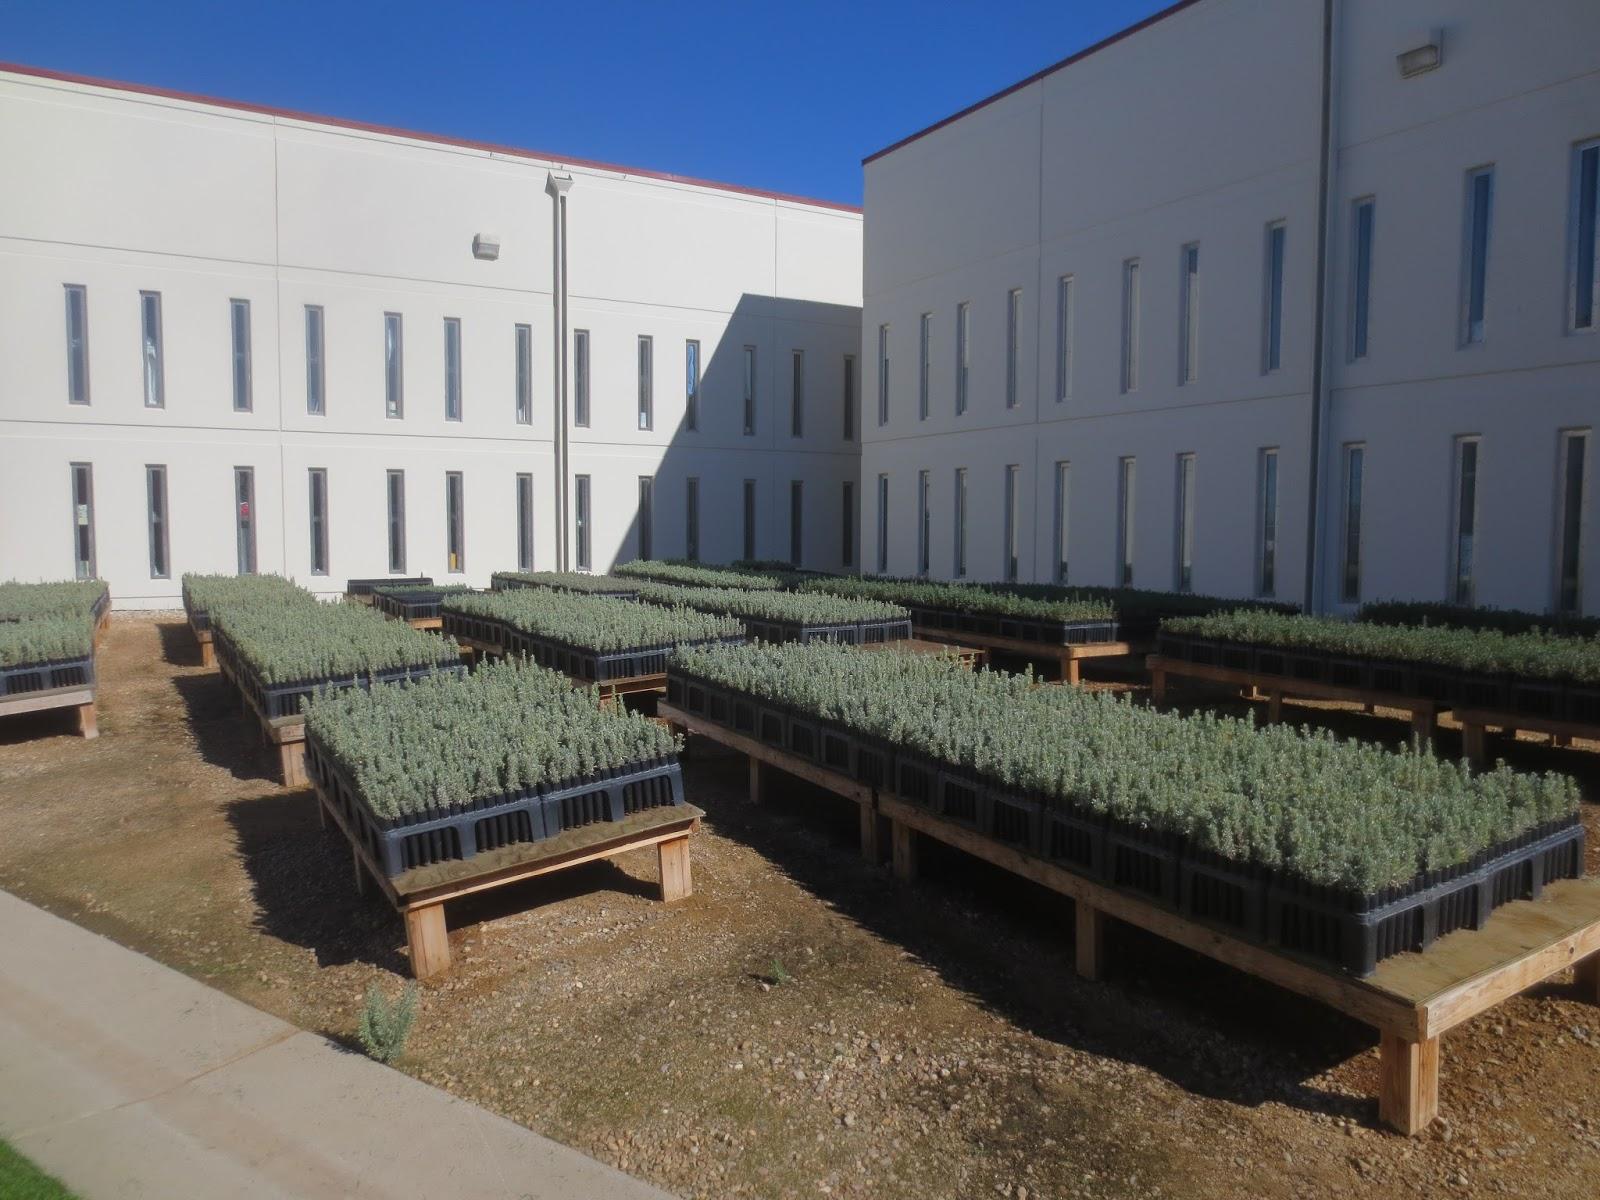 Idaho Fire Information: Sagebrush in Prison Project yields